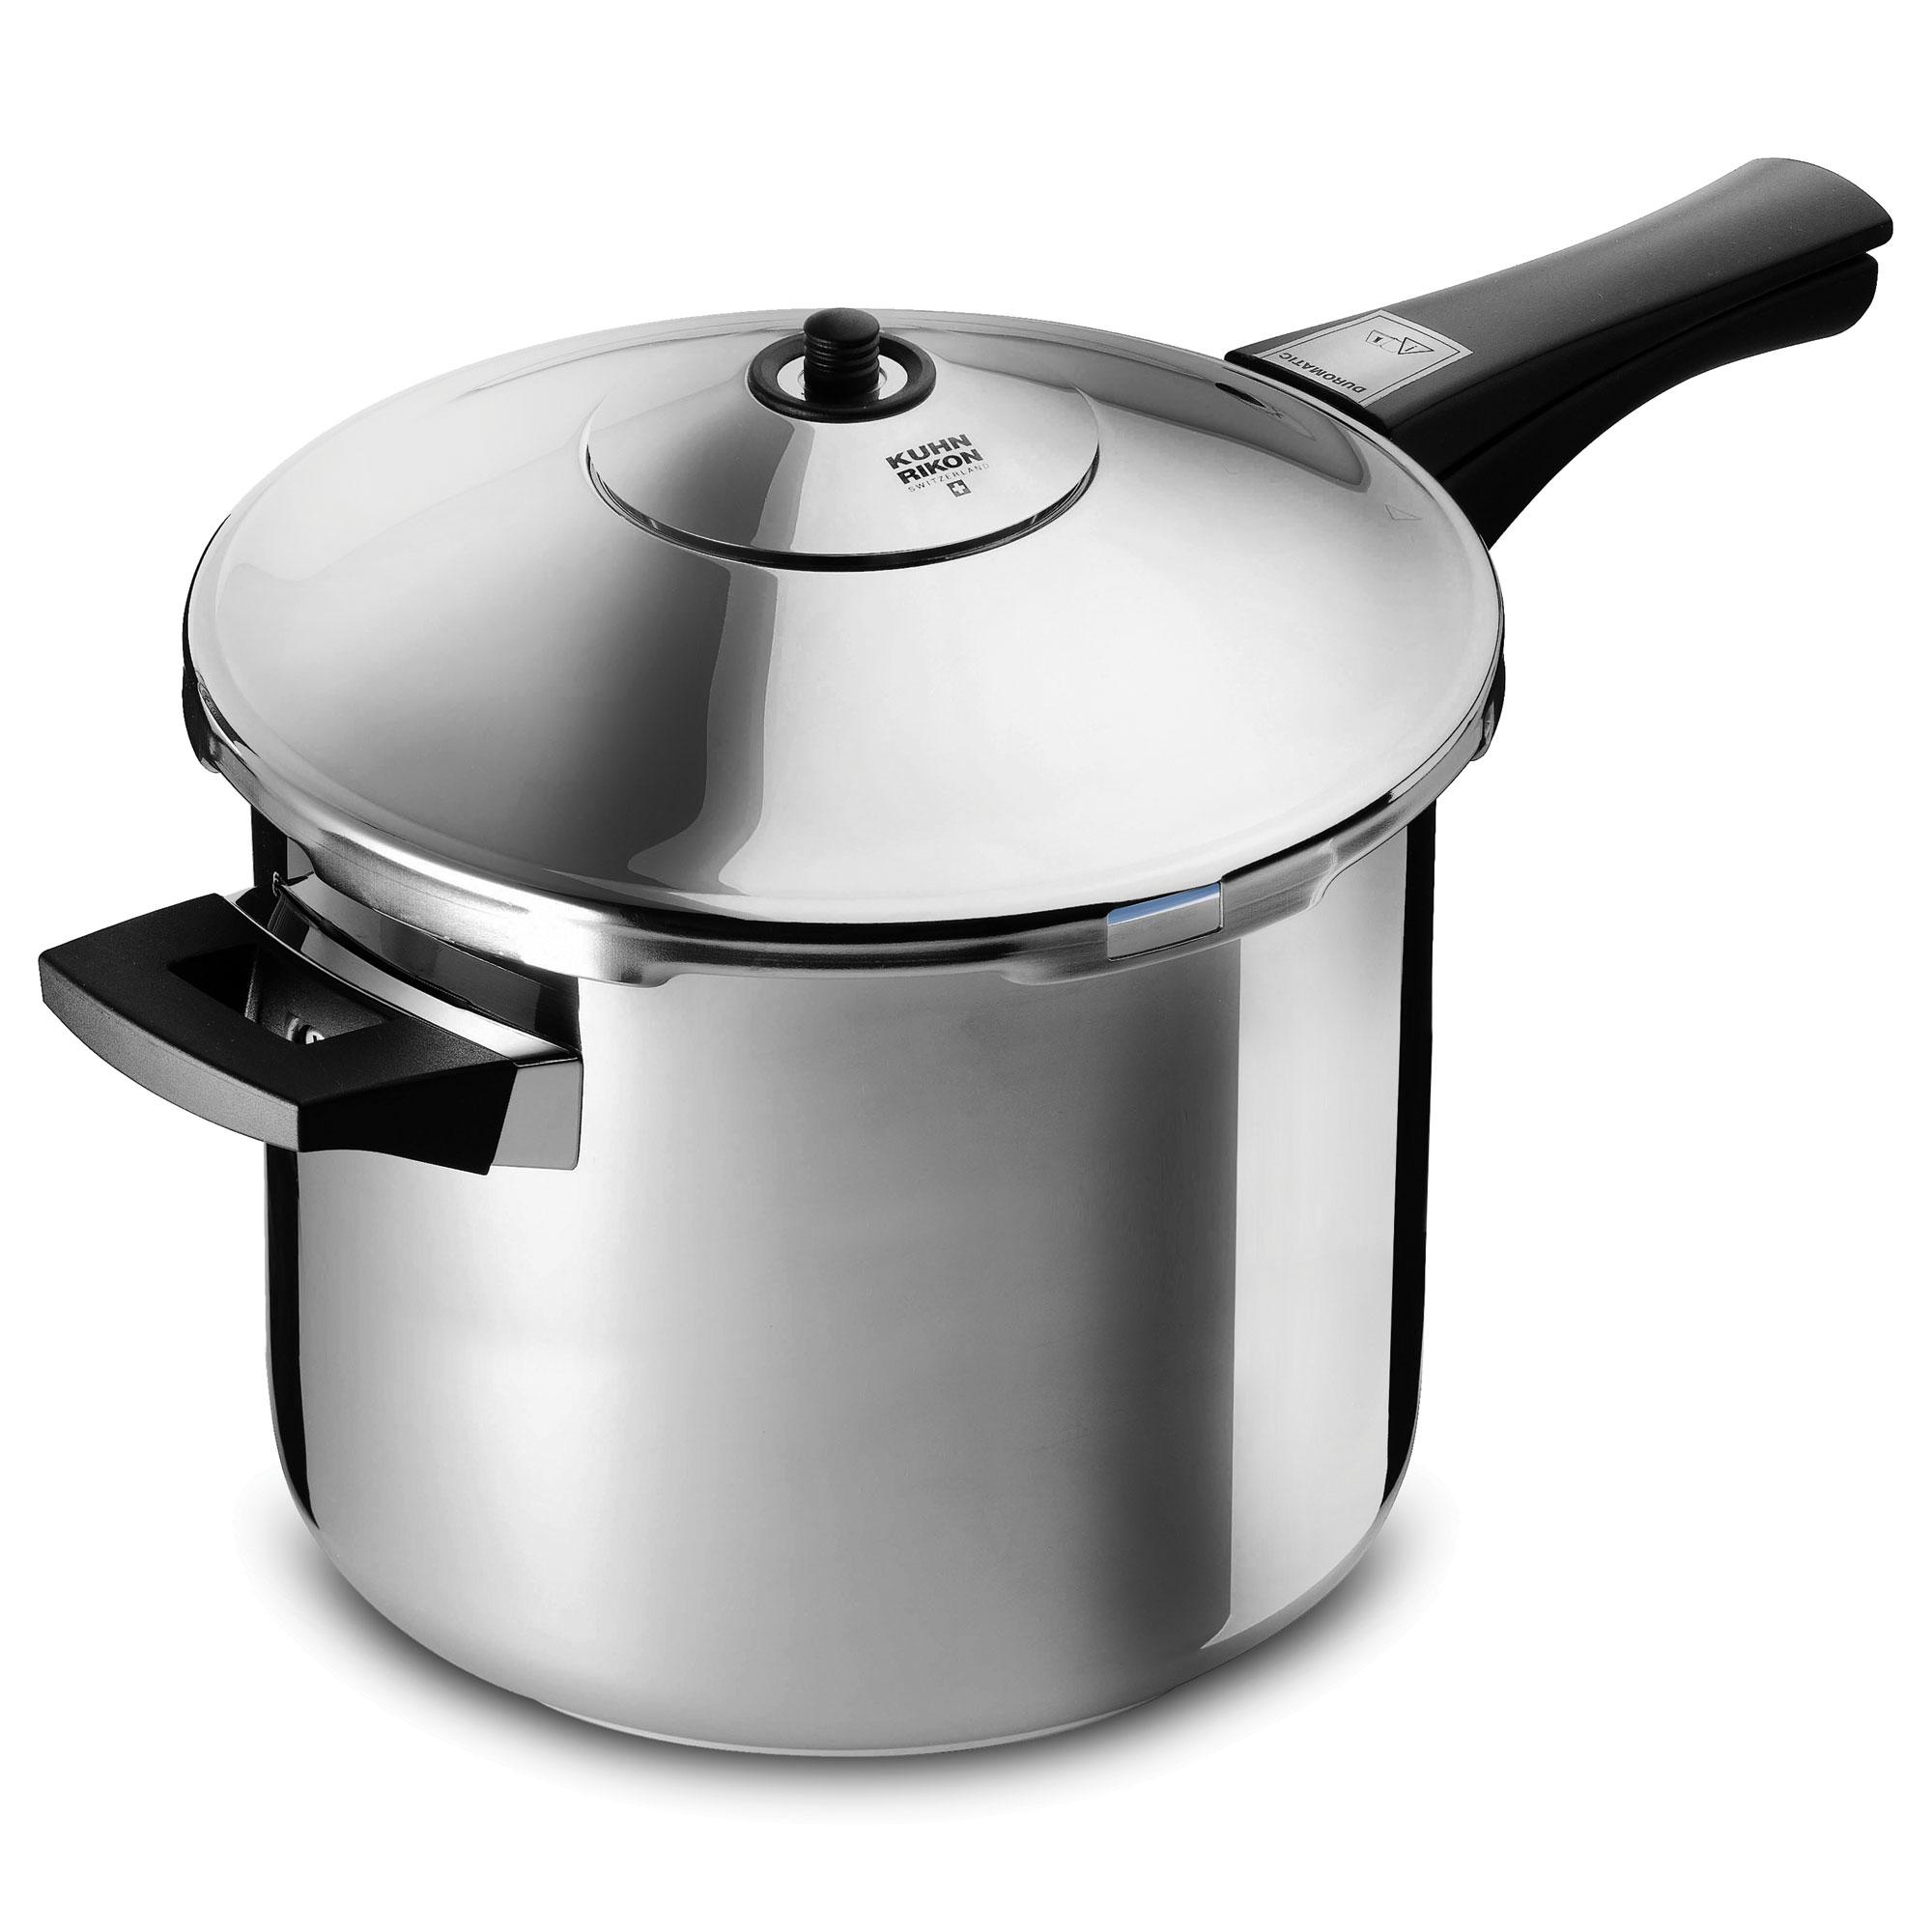 Kuhn Rikon Duromatic Stainless Steel Saucepan Pressure